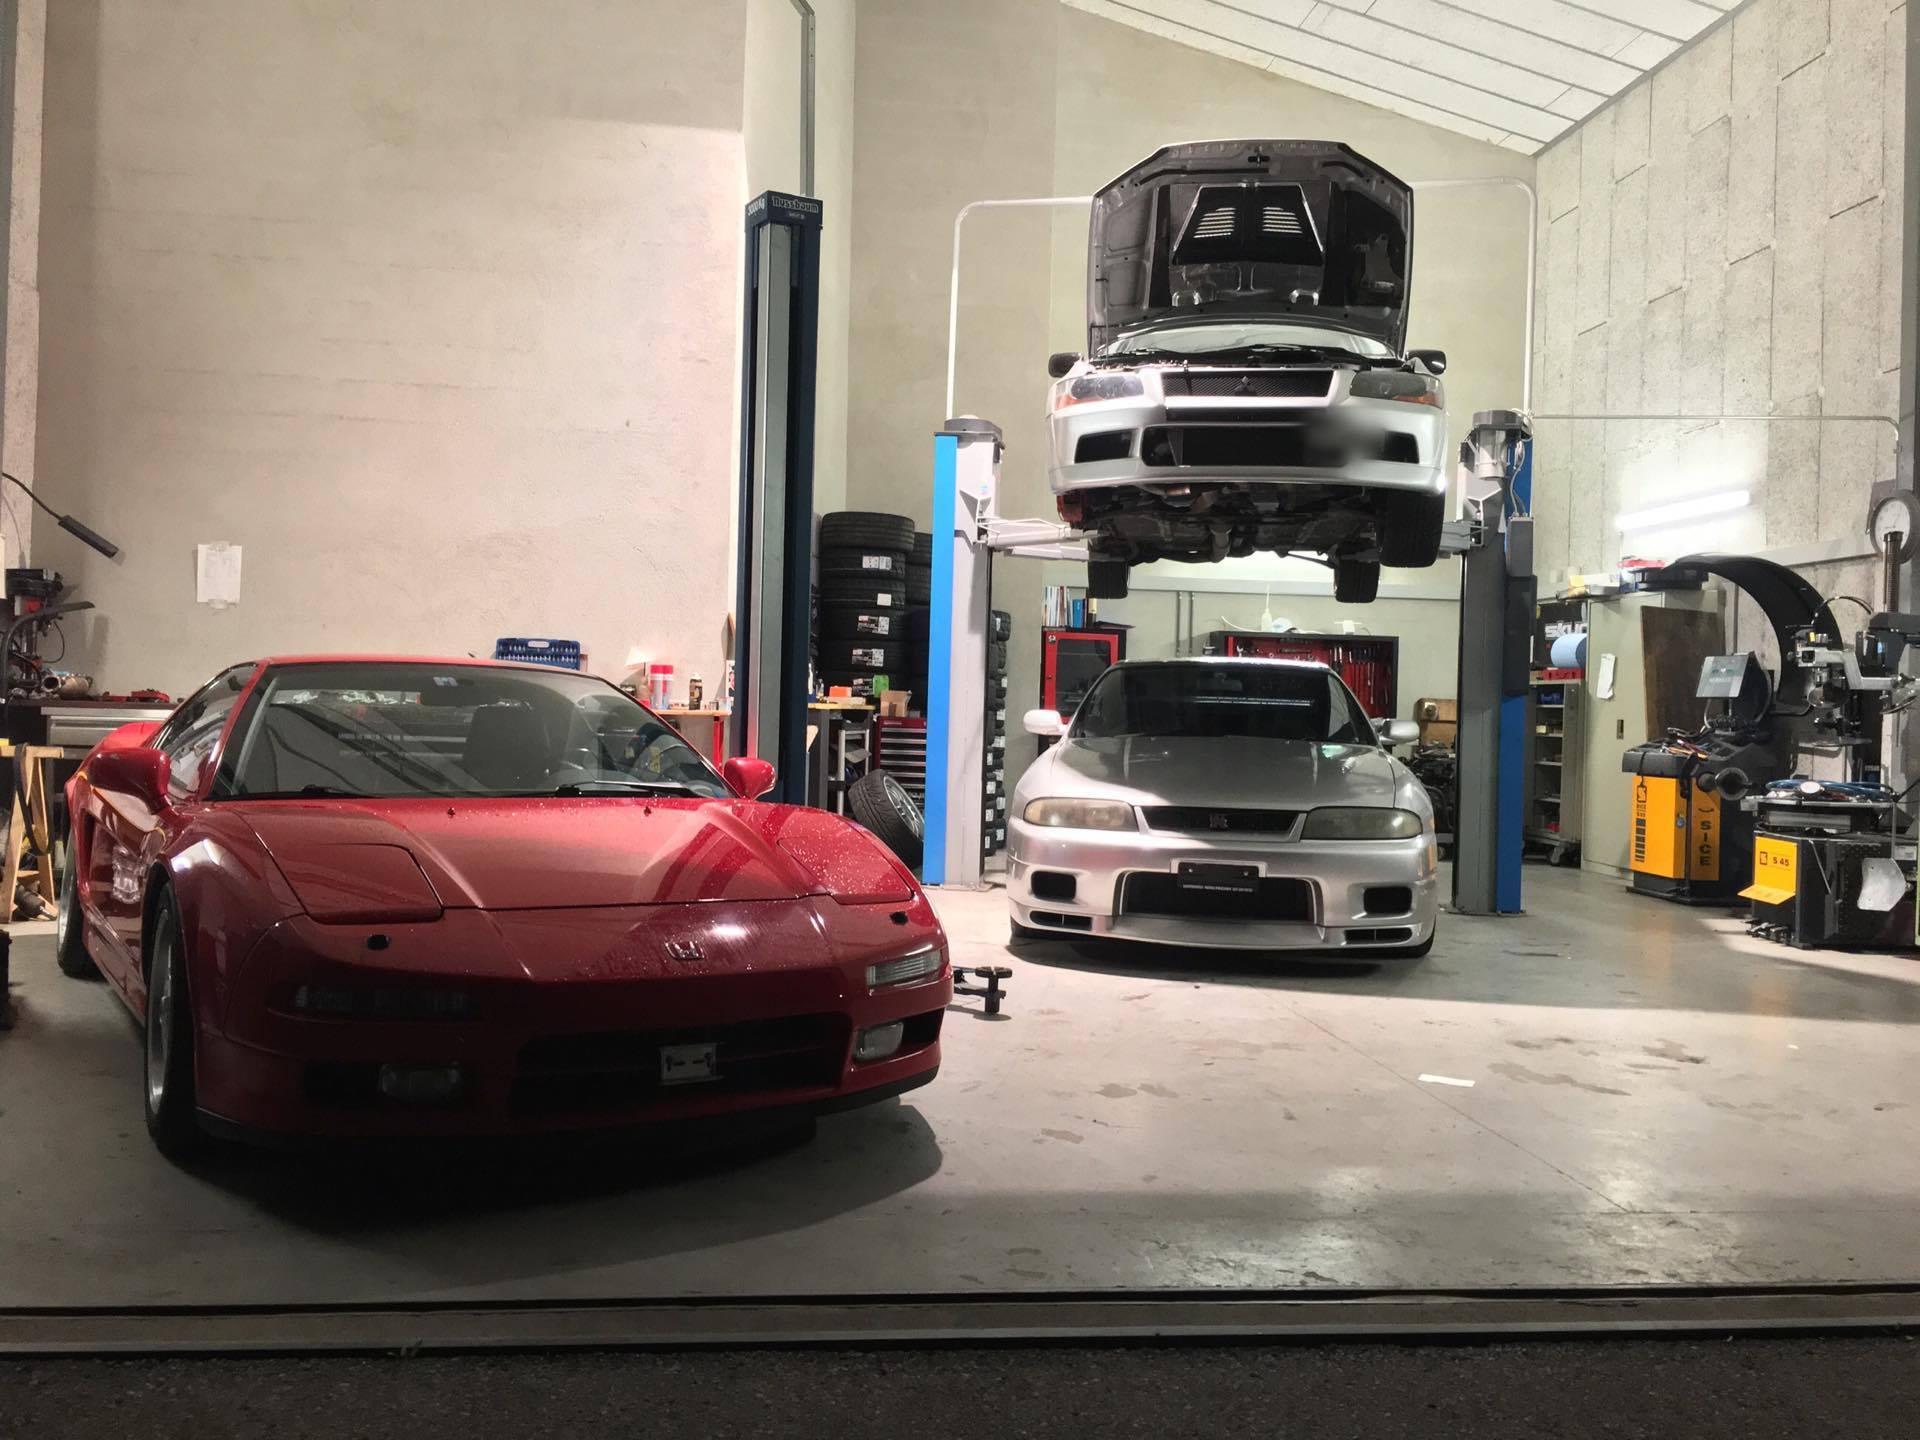 NSX - Evo 7 - GTR33